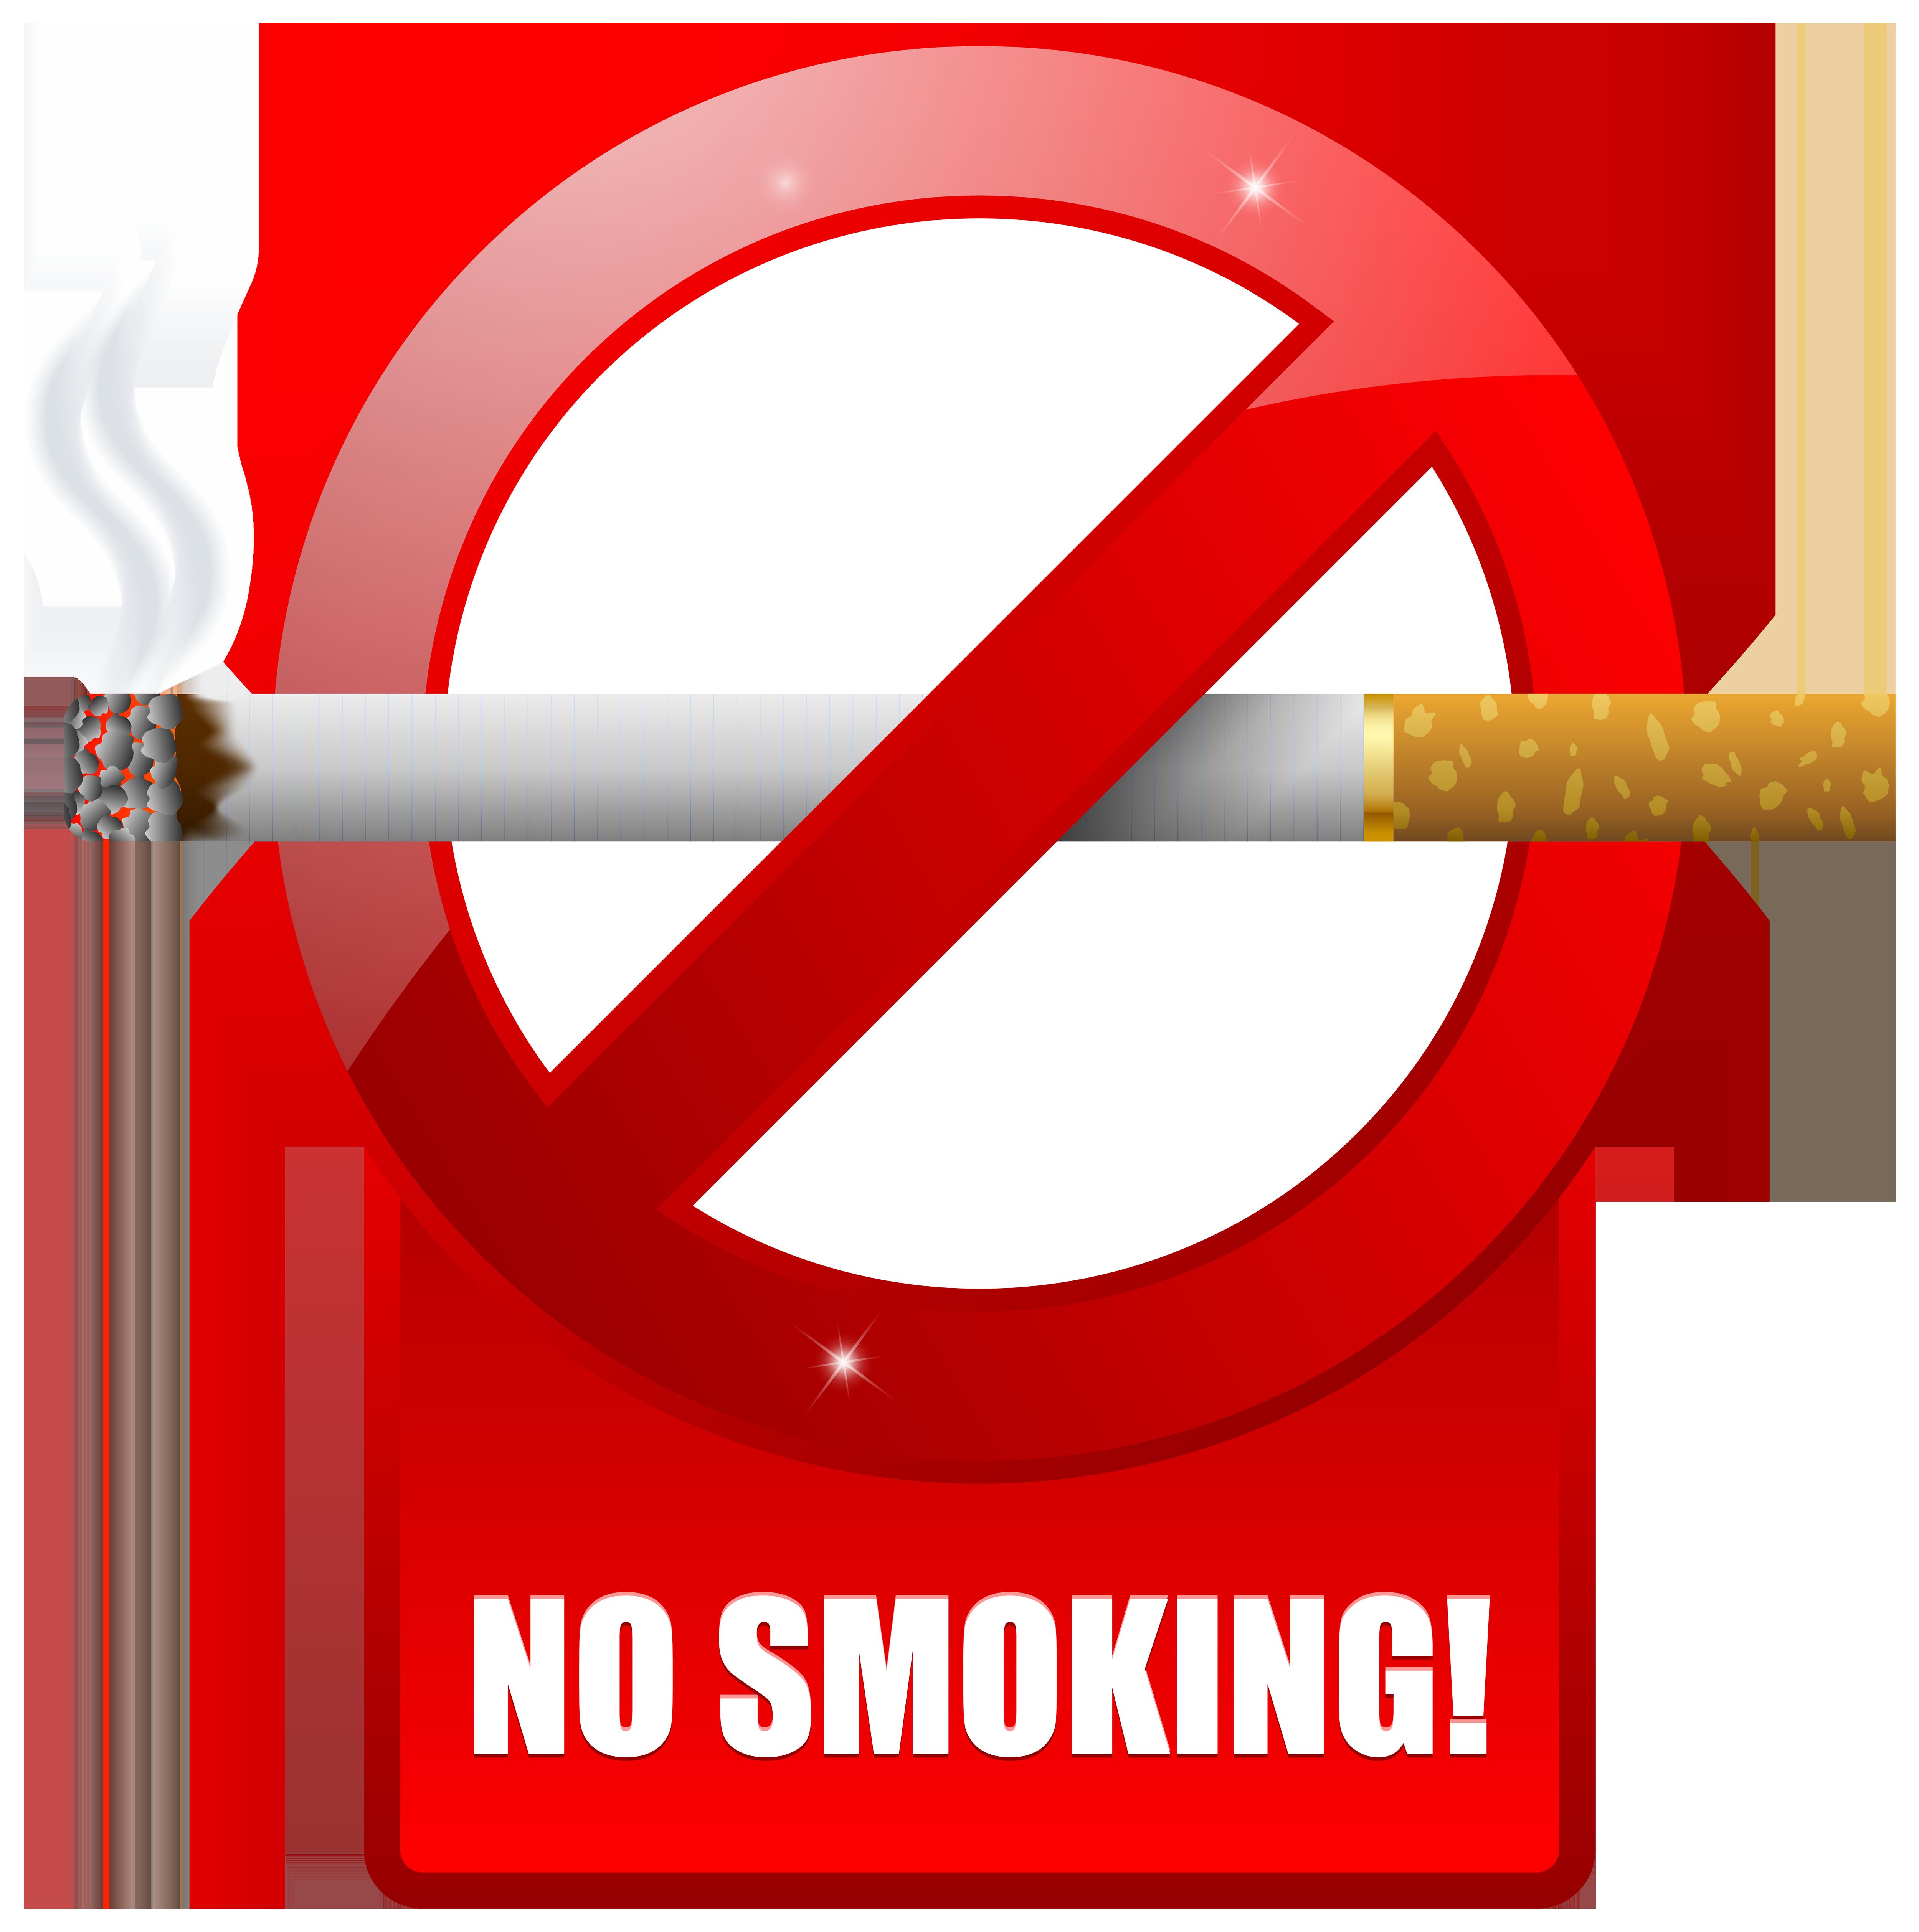 No smoking sign airplane clipart clipground no smoking warning sign png clipart buycottarizona Gallery